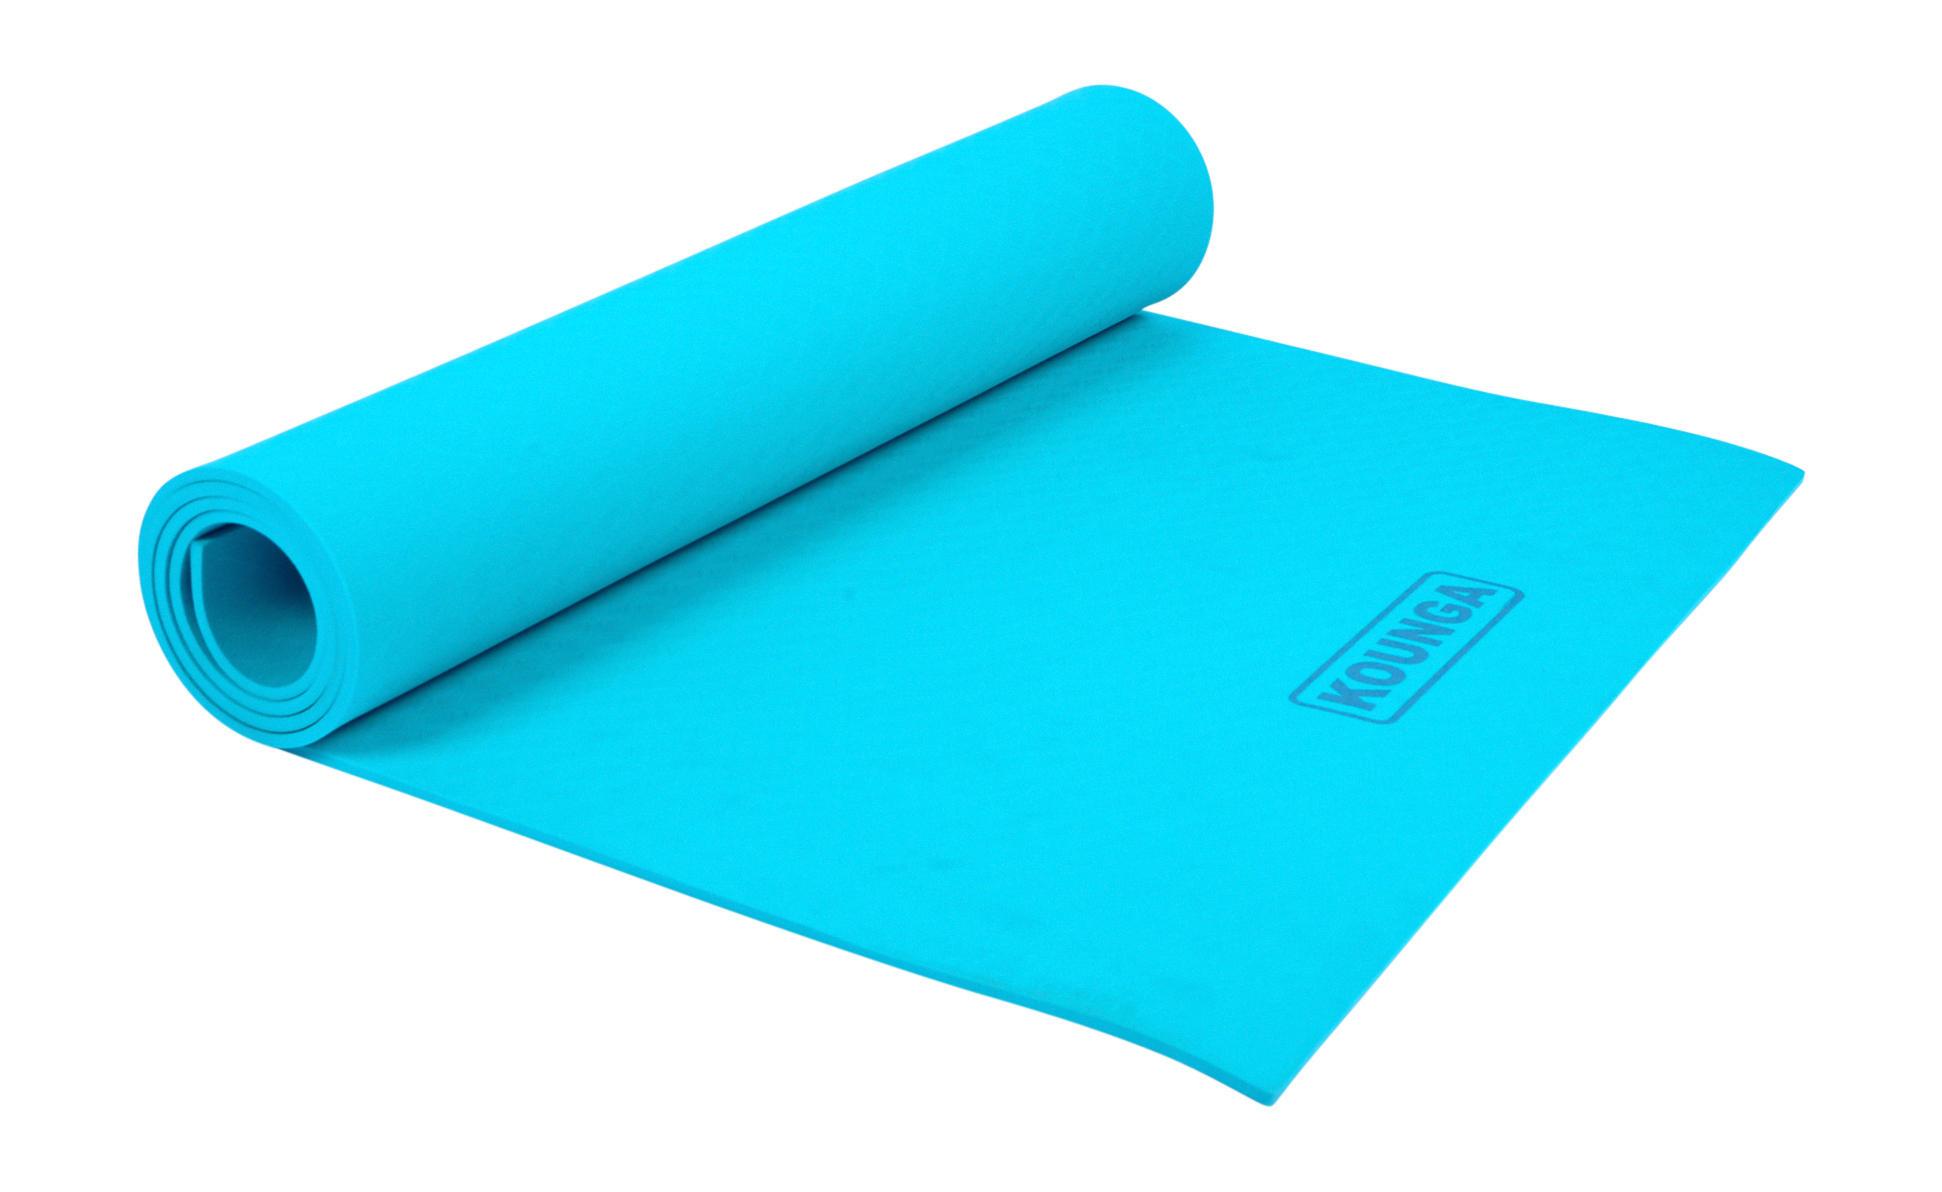 Mat de Yoga Kounga 5mm para Niños TPE Bicolor con correa para transportar